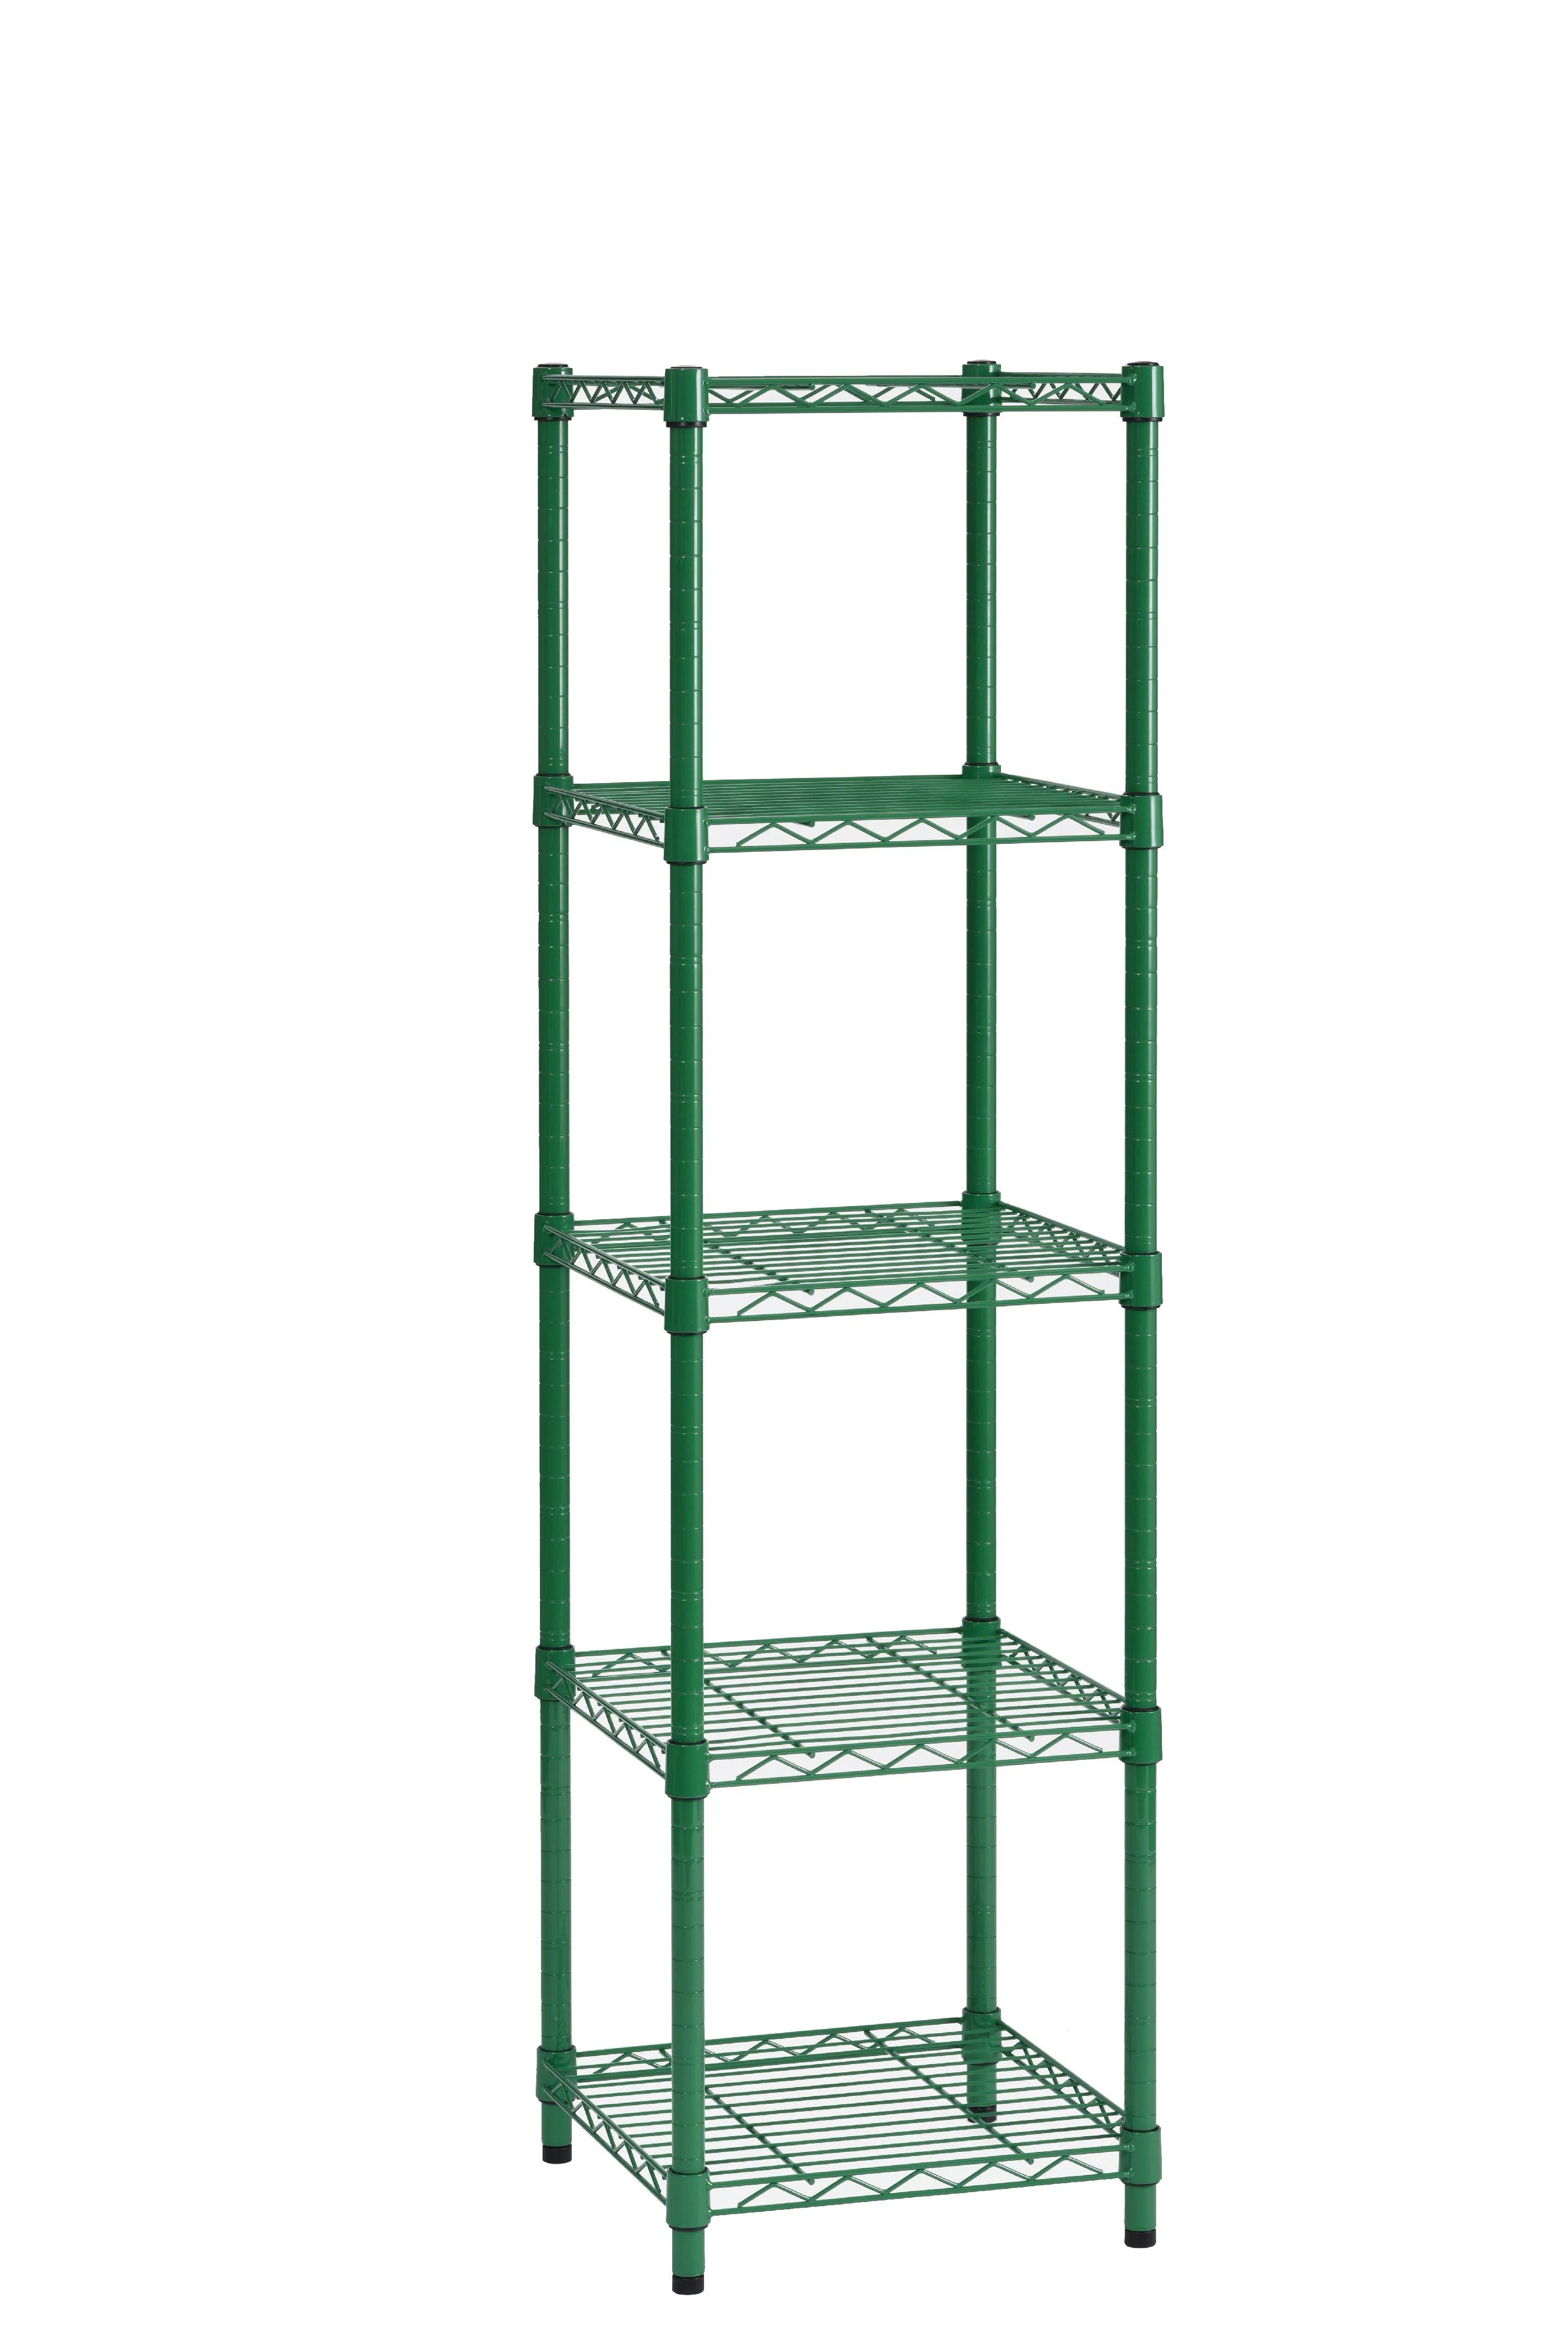 muscle rack 5 shelf wire shelving green 16 d x 16 w x 57 h